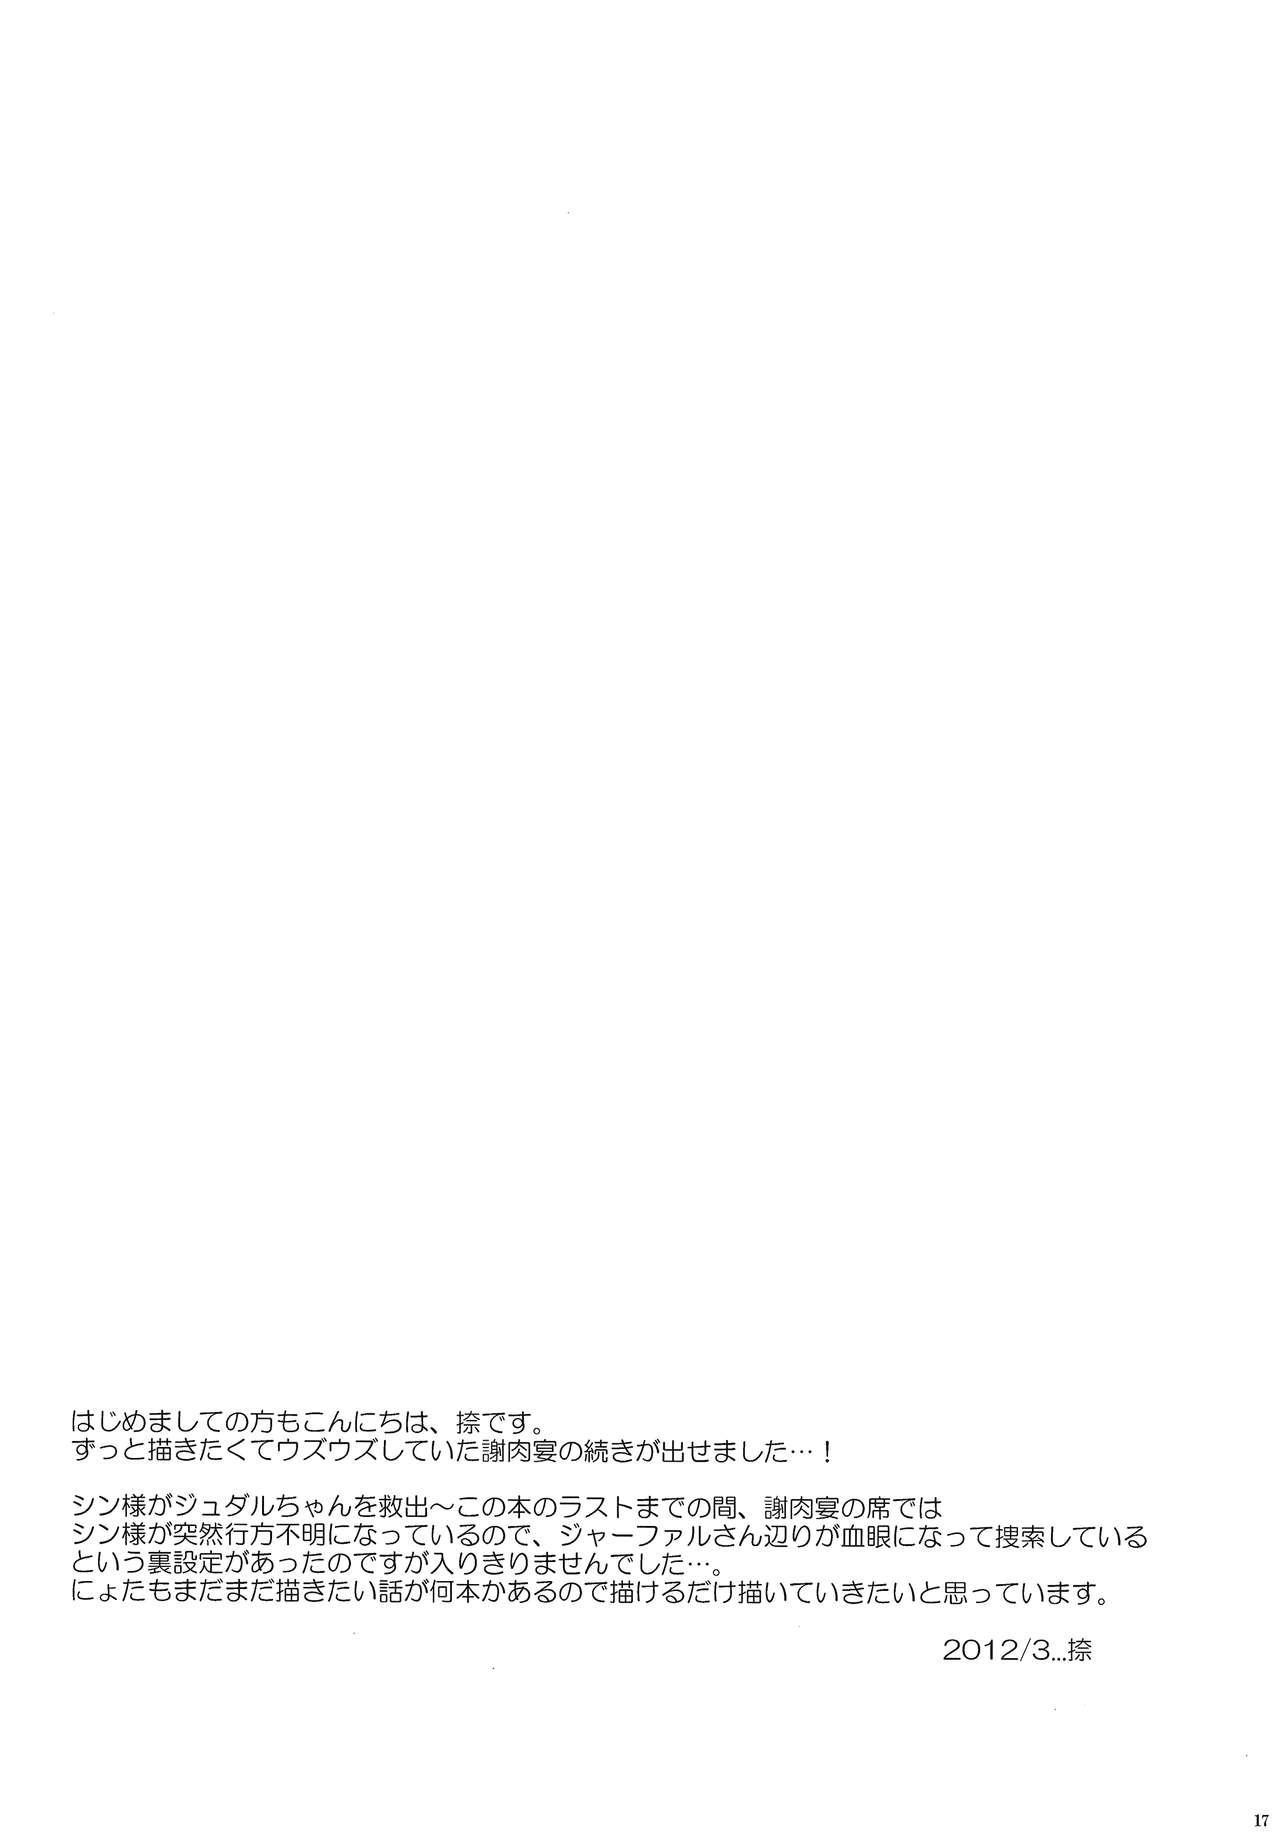 [360°C (Natsu)] Shanikuen e youkoso! 2 -Judal-chan ga Onnanoko na Hon 2.5-   Welcome to the Festival! 2 ~A book where Judal is a girl 2.5~ (Magi: The Labyrinth of Magic) [English] 15